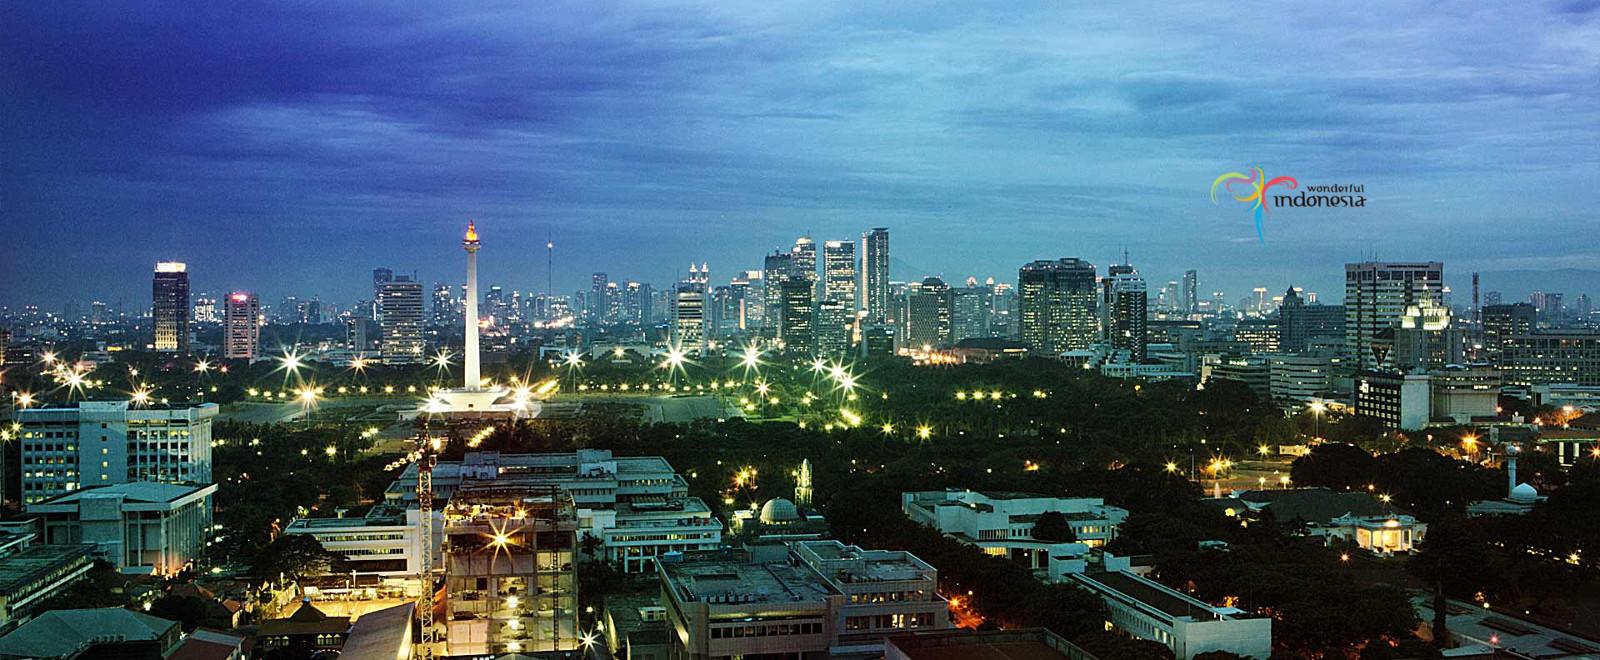 Landskap tempat wisata di Jakarta